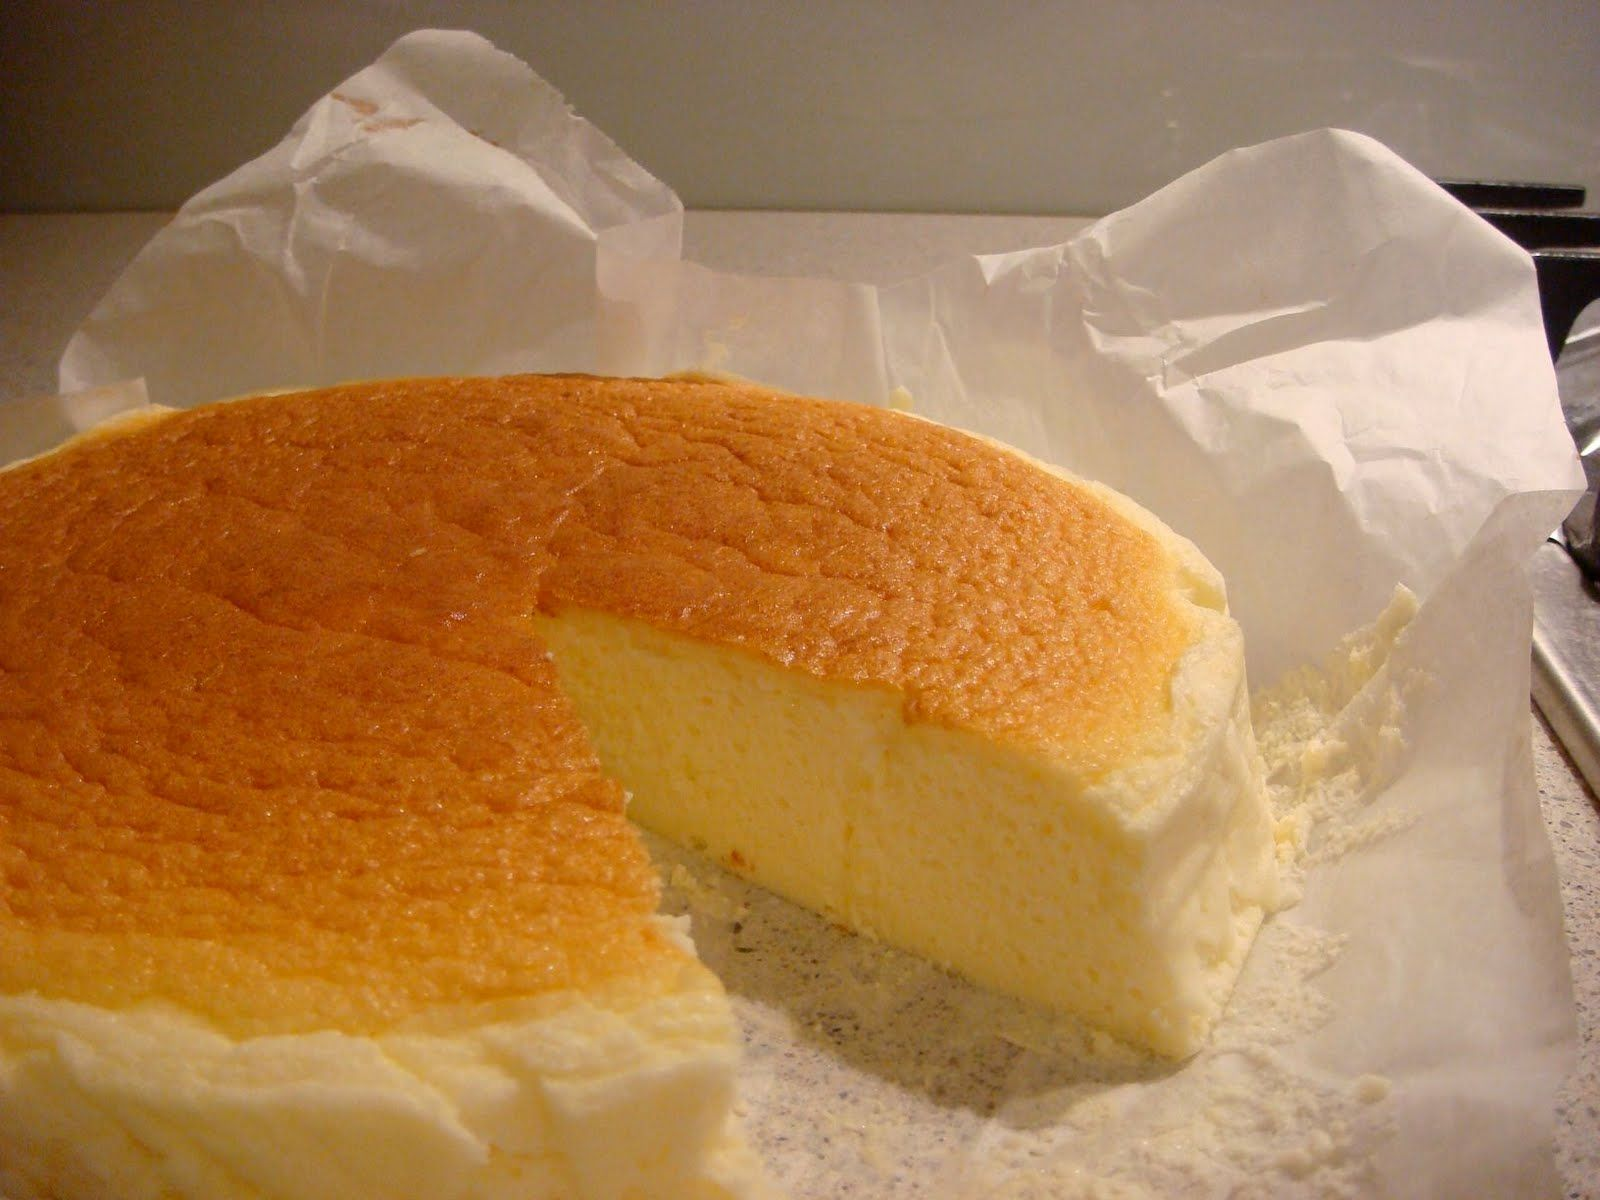 Japanese Cheesecake Just Pound Cake